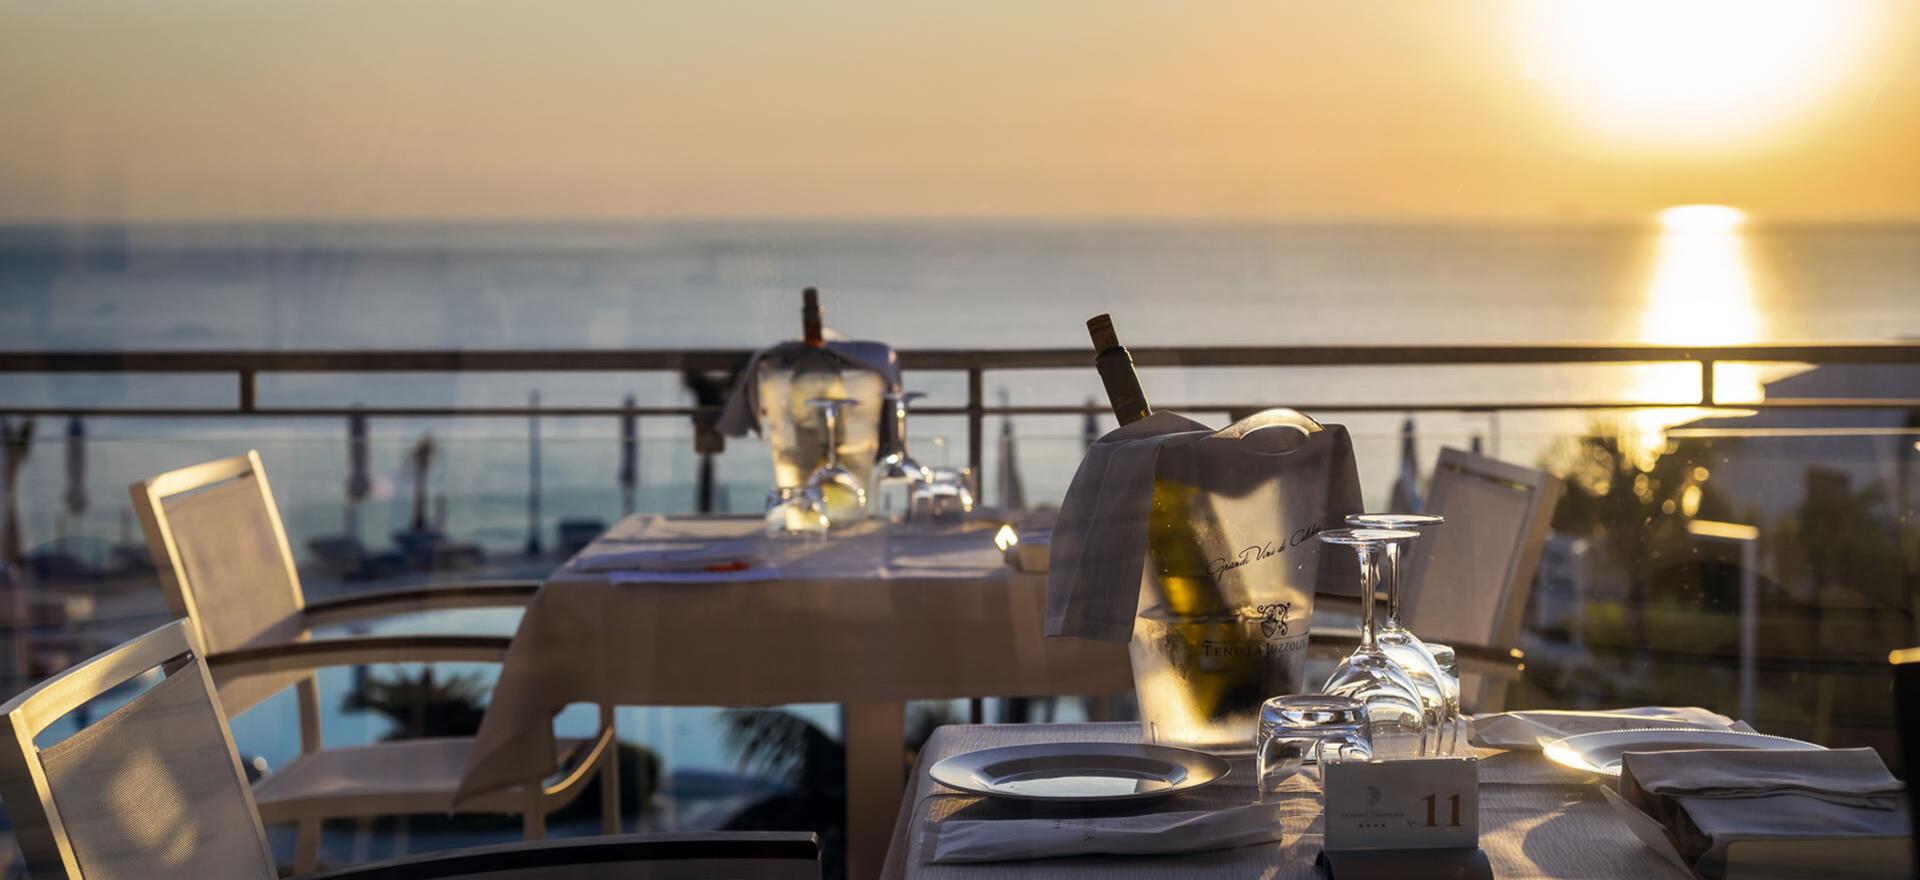 borgodonnacanfora it ristorante 001